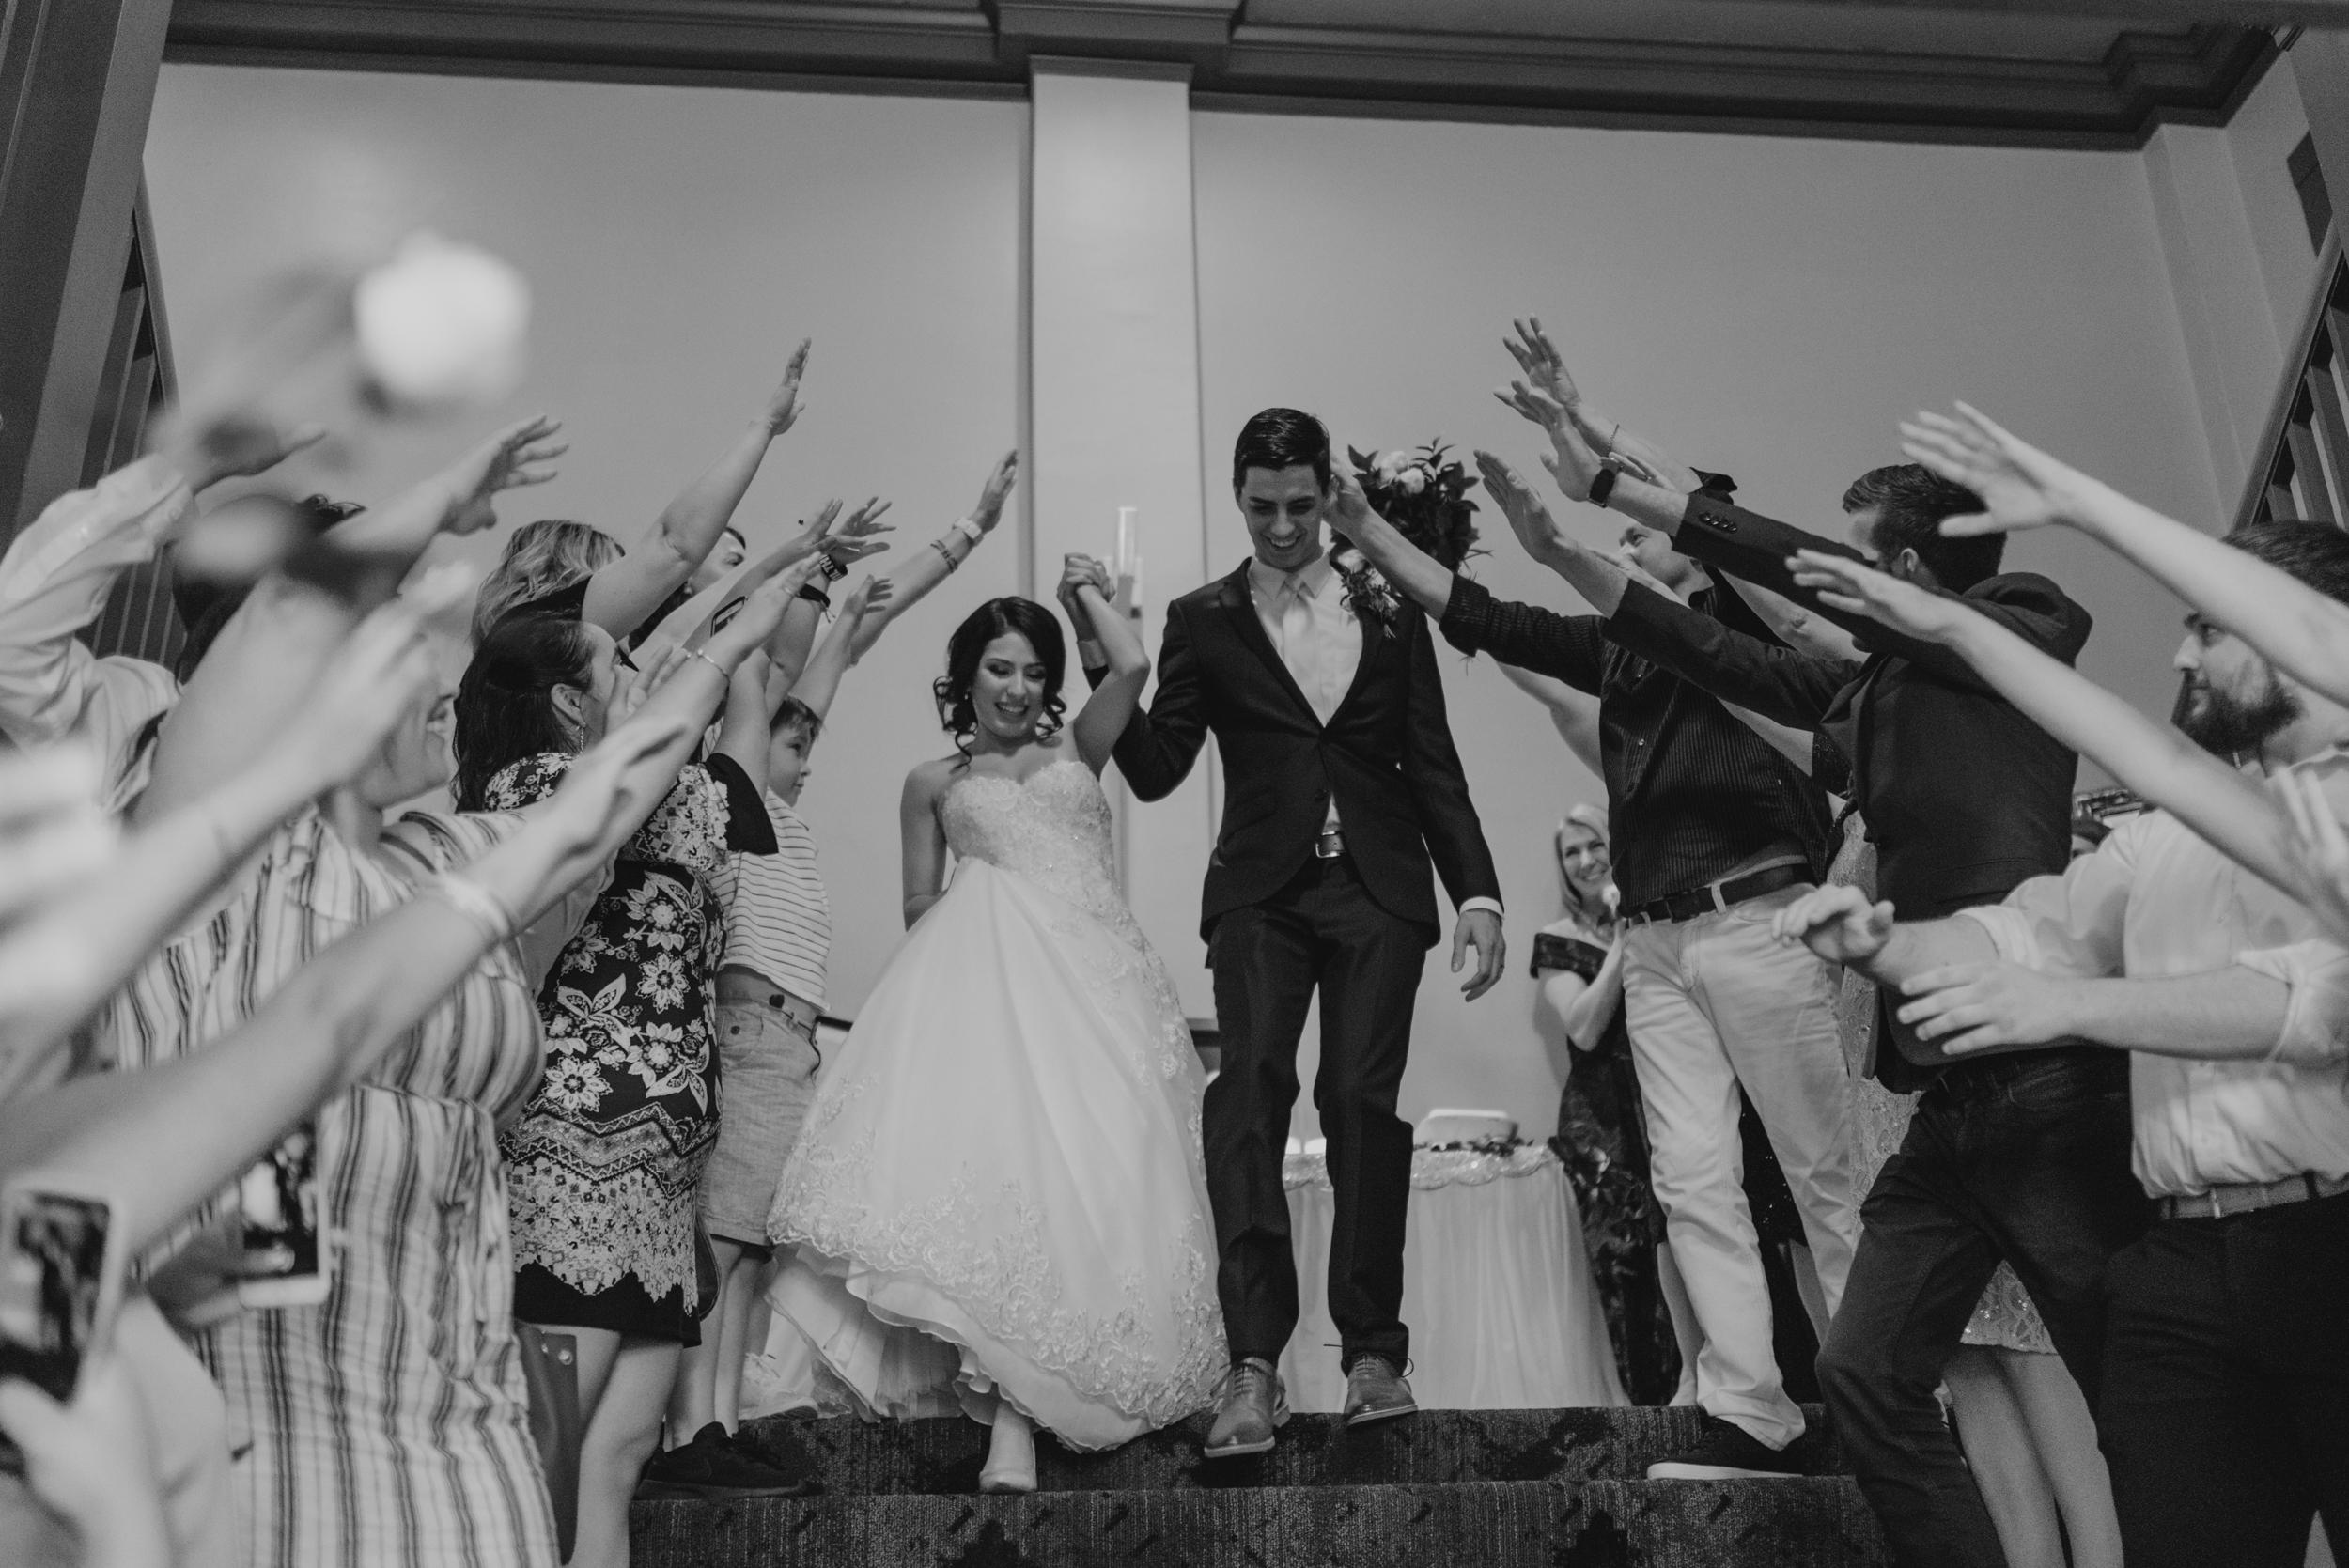 139-reception-west-end-ballroom-portland-wedding-photographer-8971.jpg